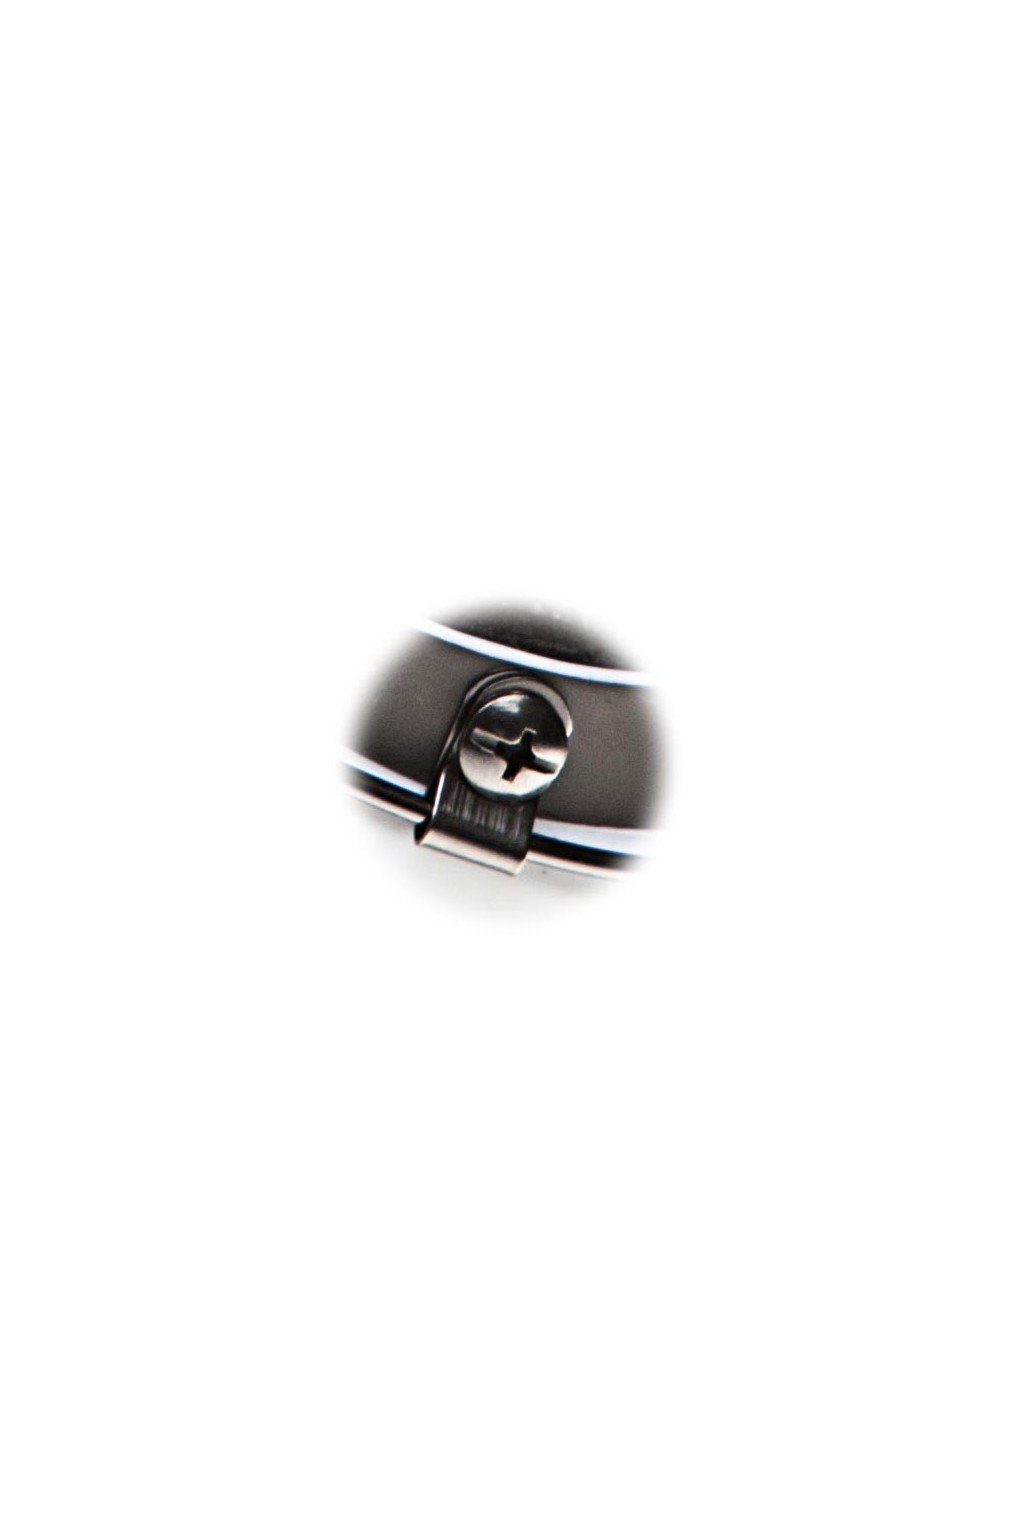 salming elit helmet screws and clips